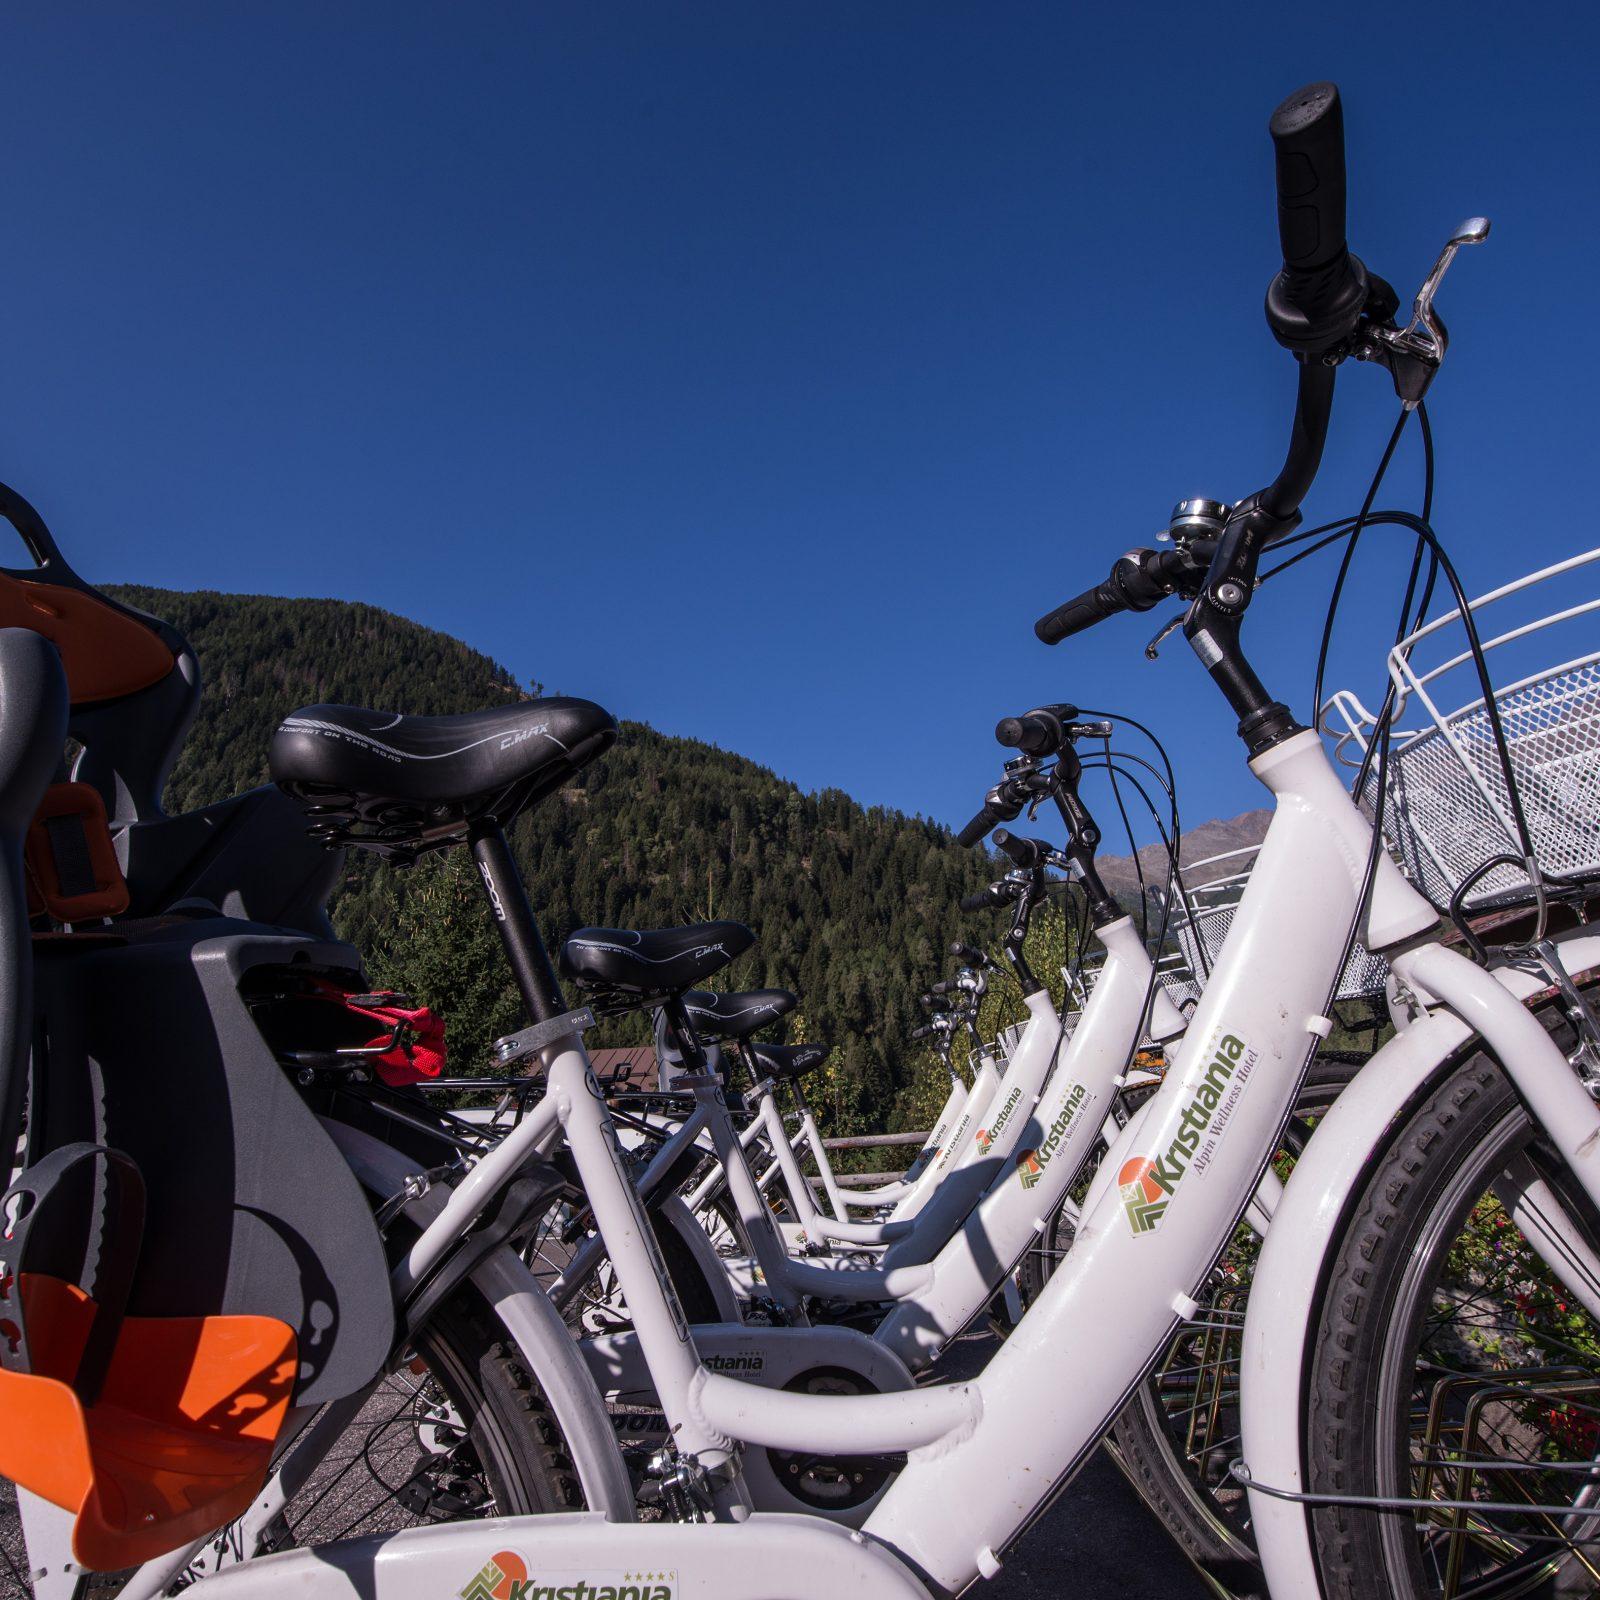 Immagine per Bike hotel service per escursioni in bici a Pejo, Val di Sole